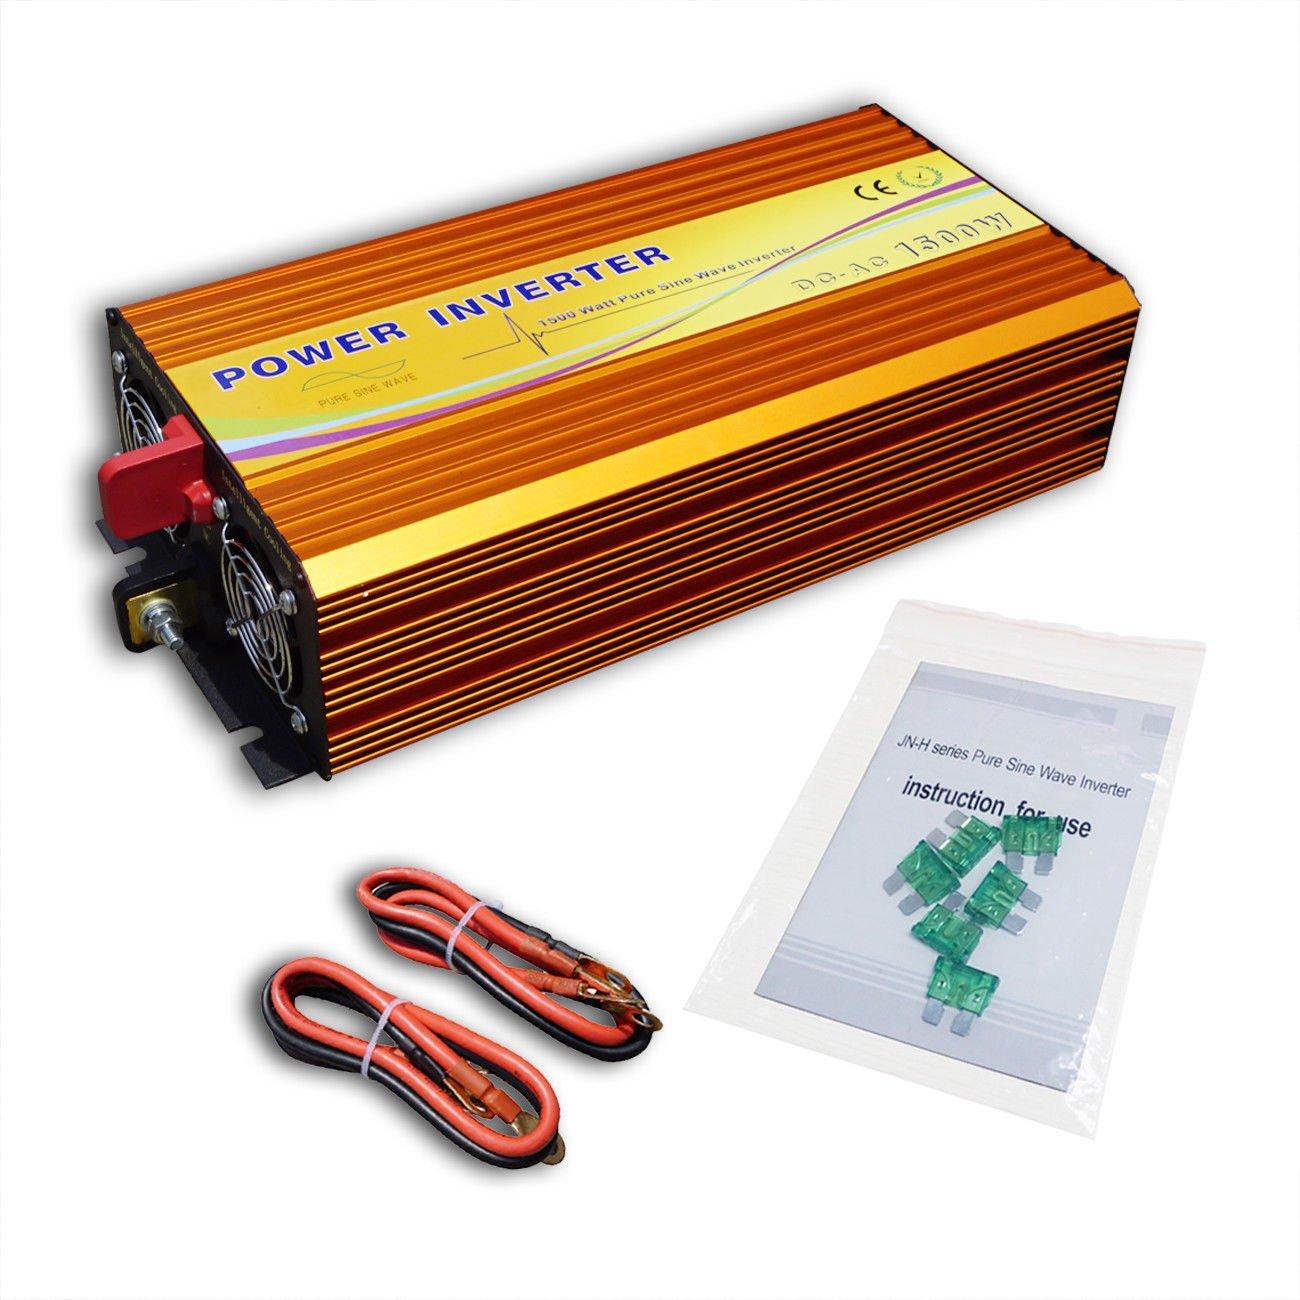 20A-Batterie-Regler laden intelligenten Controller f/ür das 12//24V-Ladesystem im Home Boat Caravan auf ECOWORTHY 200W 12V//24V Off-Grid-Sonnenkollektor-Kits 2 St/ück 100W Polykristallines Solarpanel